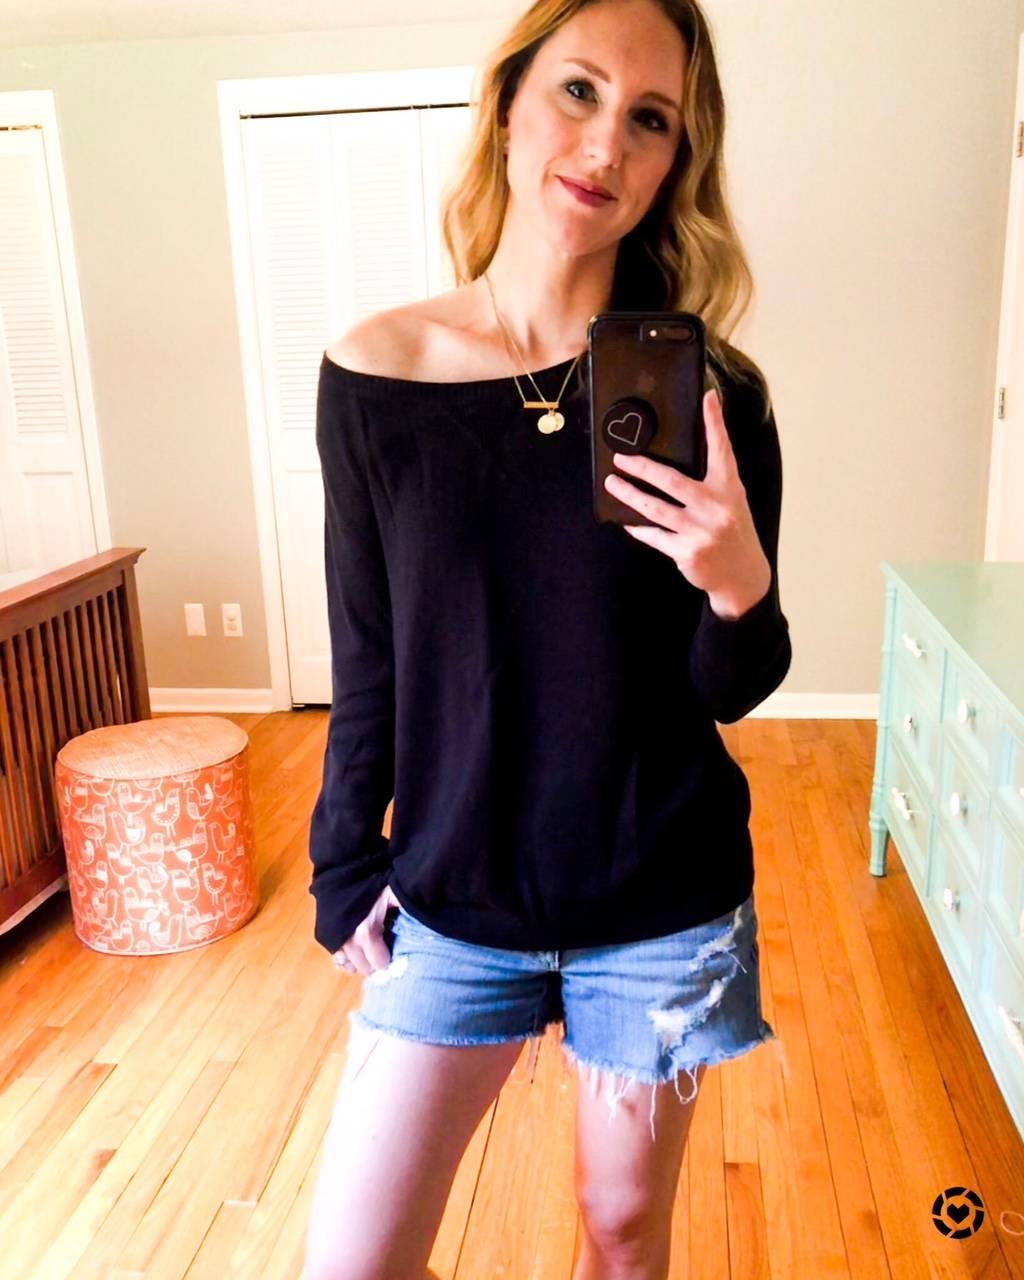 Daily Splendor - August Instagram Roundup #casualllook #fashion #sweater